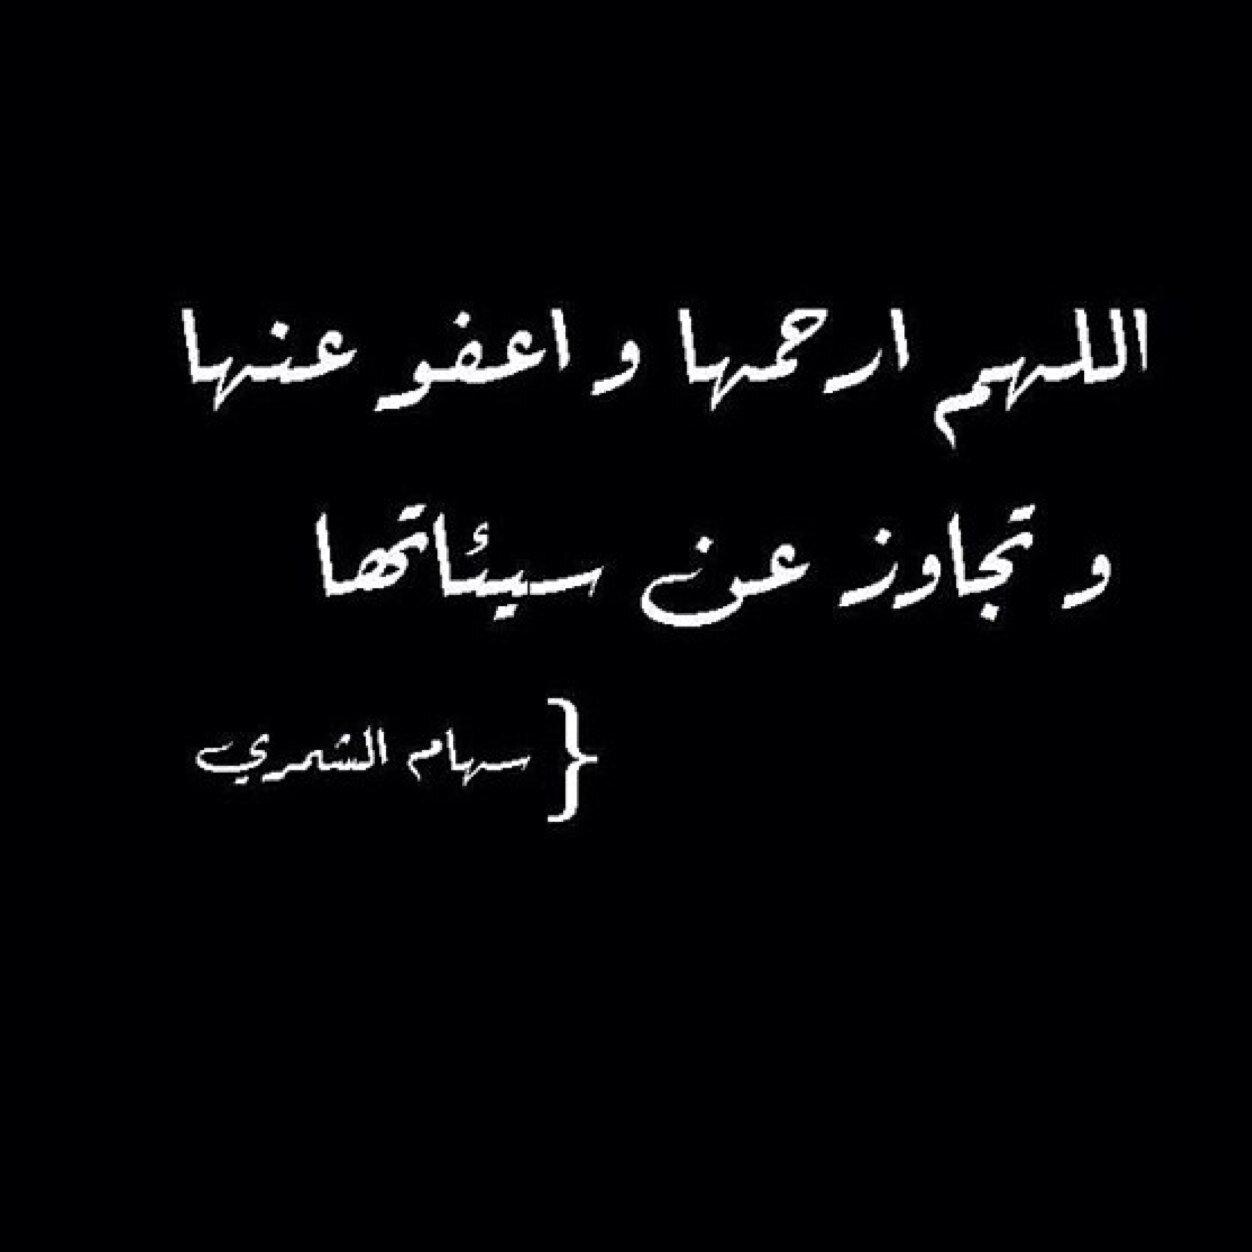 Uživatel اللهم اغفر لسهام Na Twitteru اللهم ارحم سهام